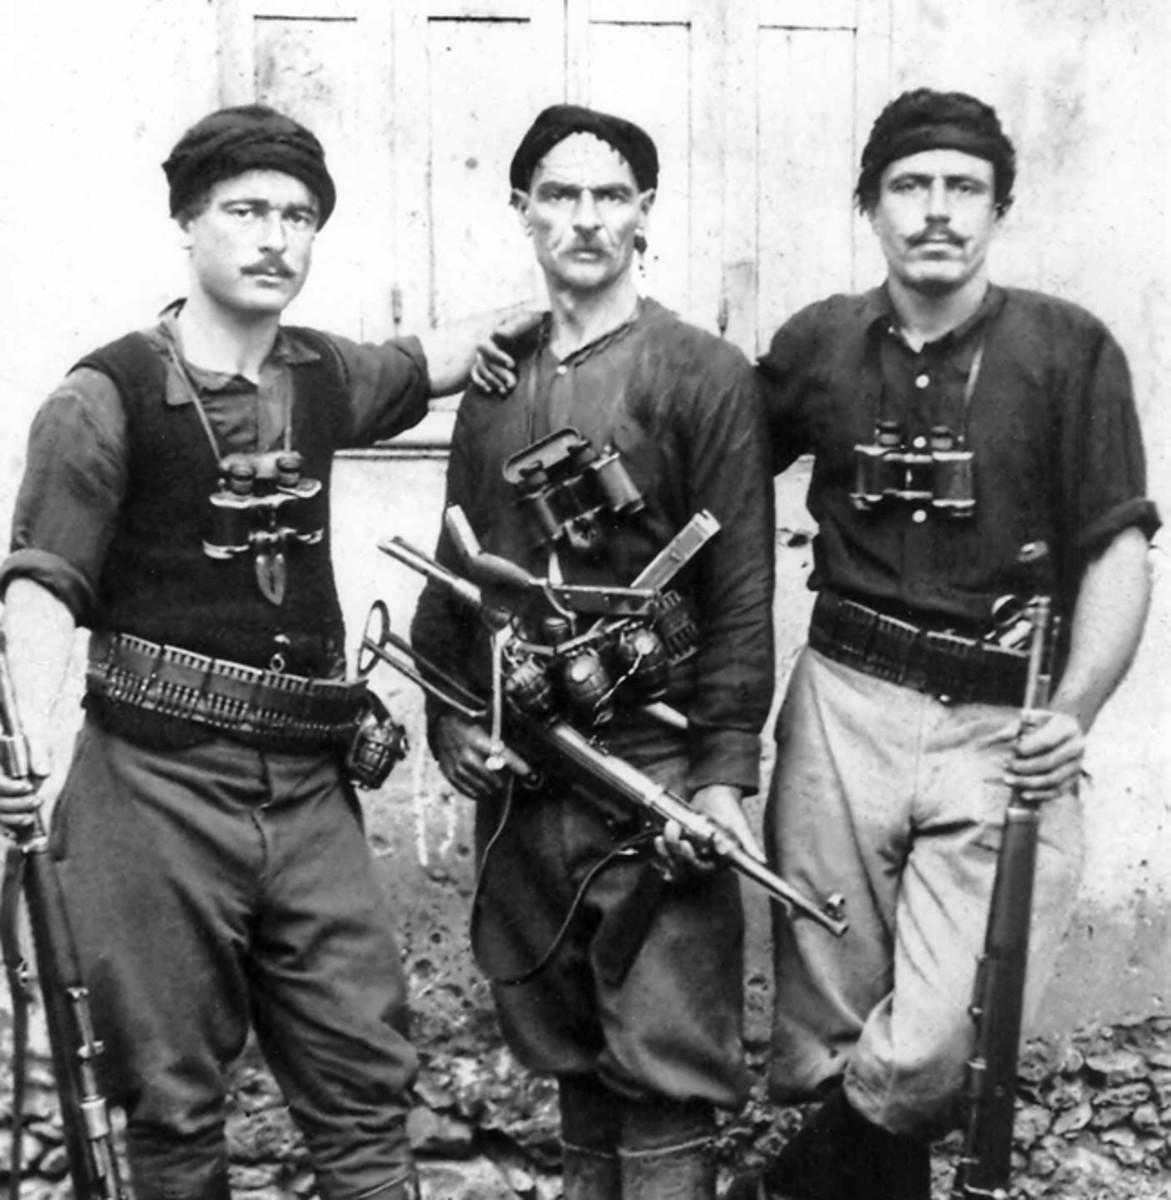 Greek partisans on Crete, 1941